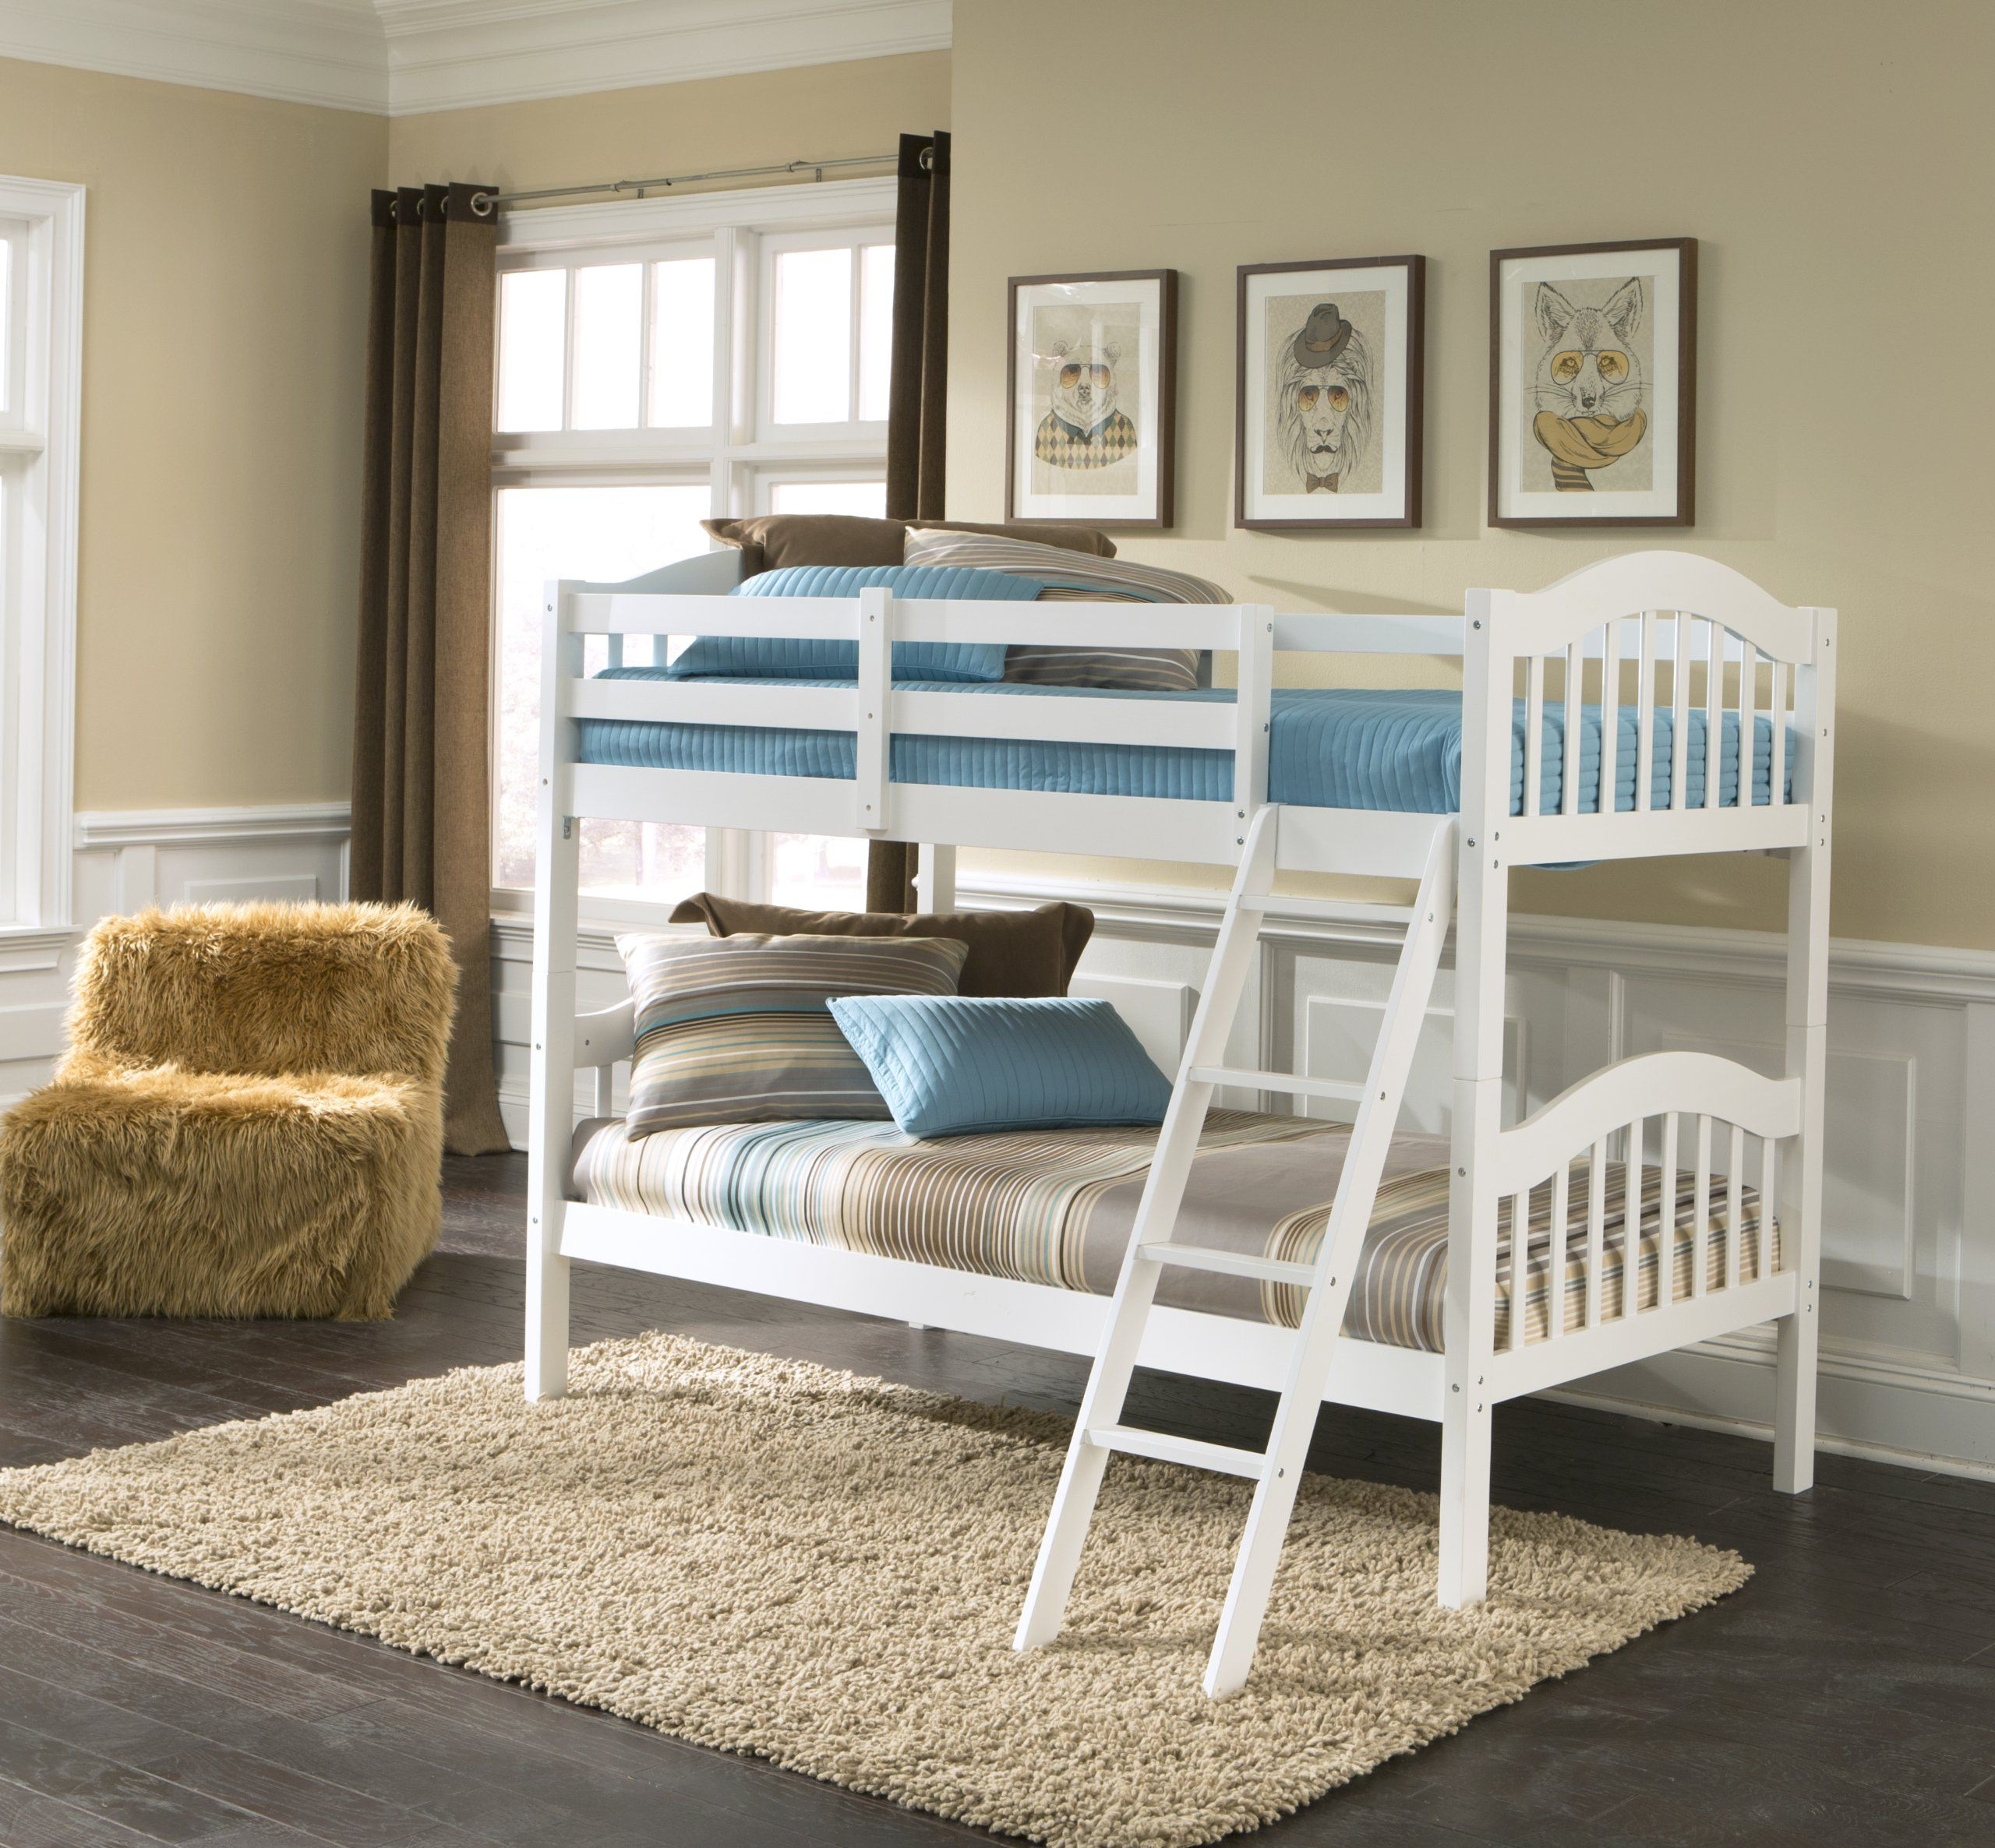 Best cheap bunk beds for kids